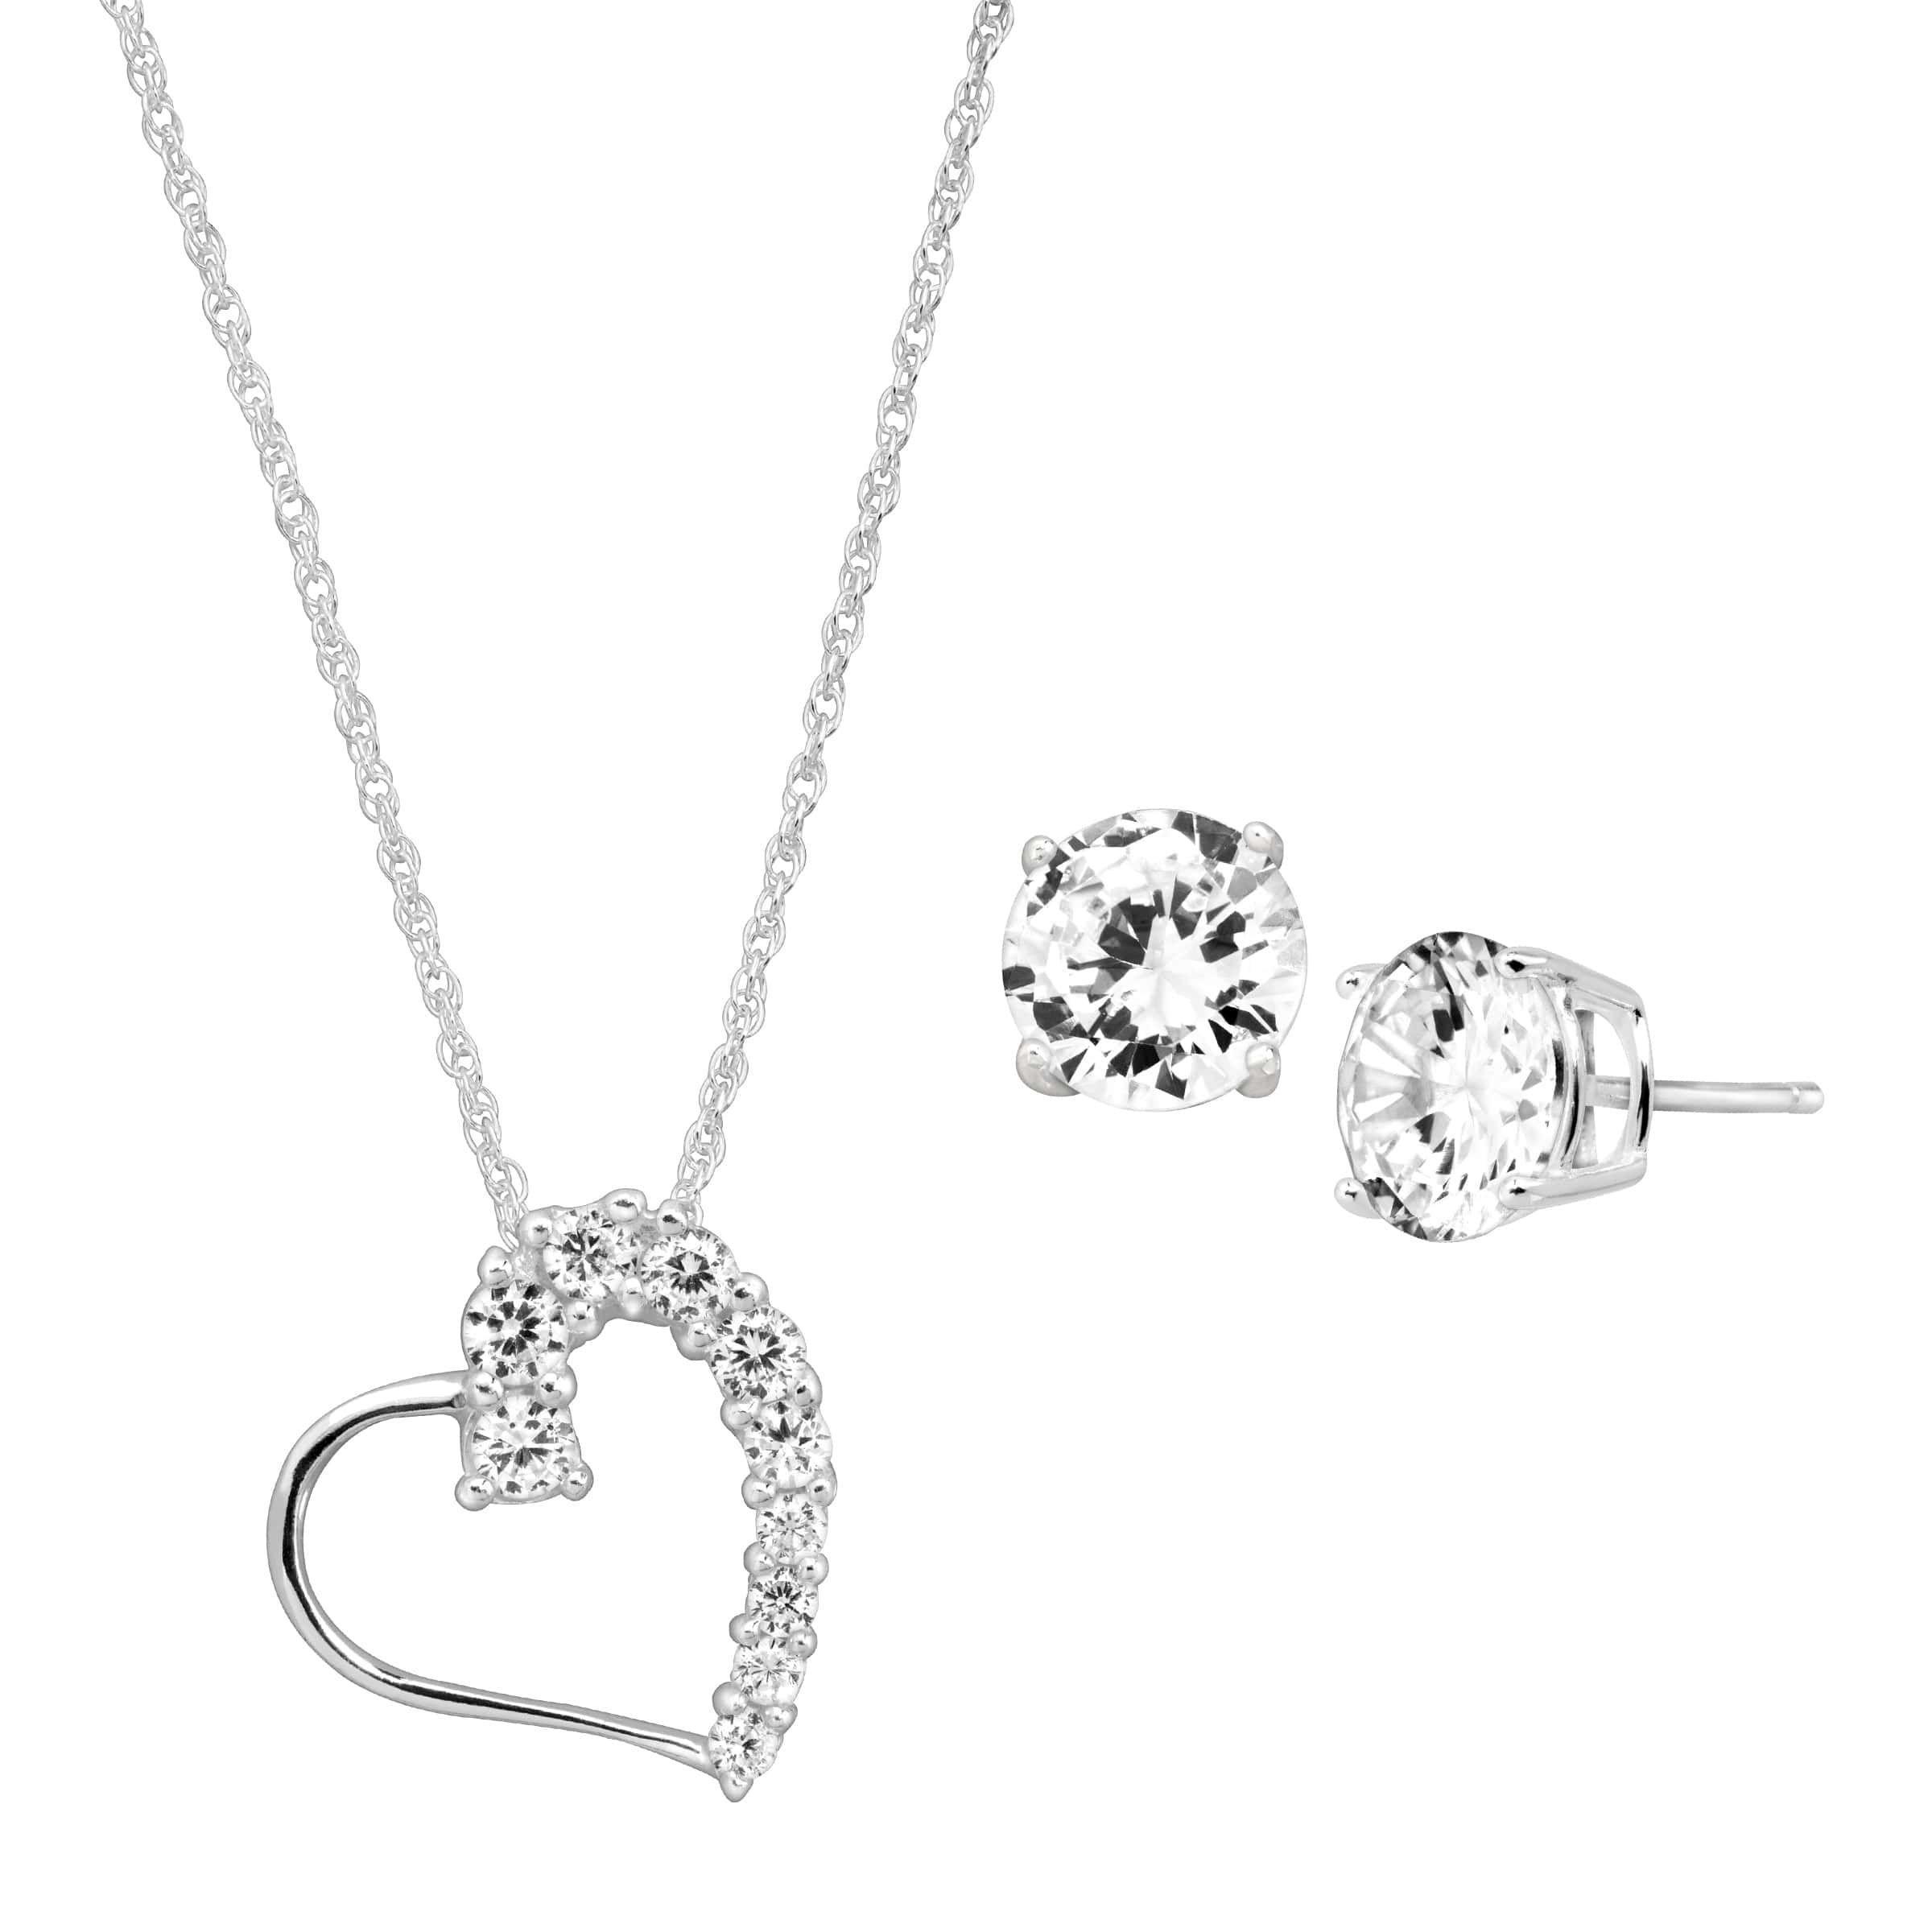 4eae520dc9ee0b Heart Pendant & Stud Earrings Set with Cubic Zirconia in Sterling ...